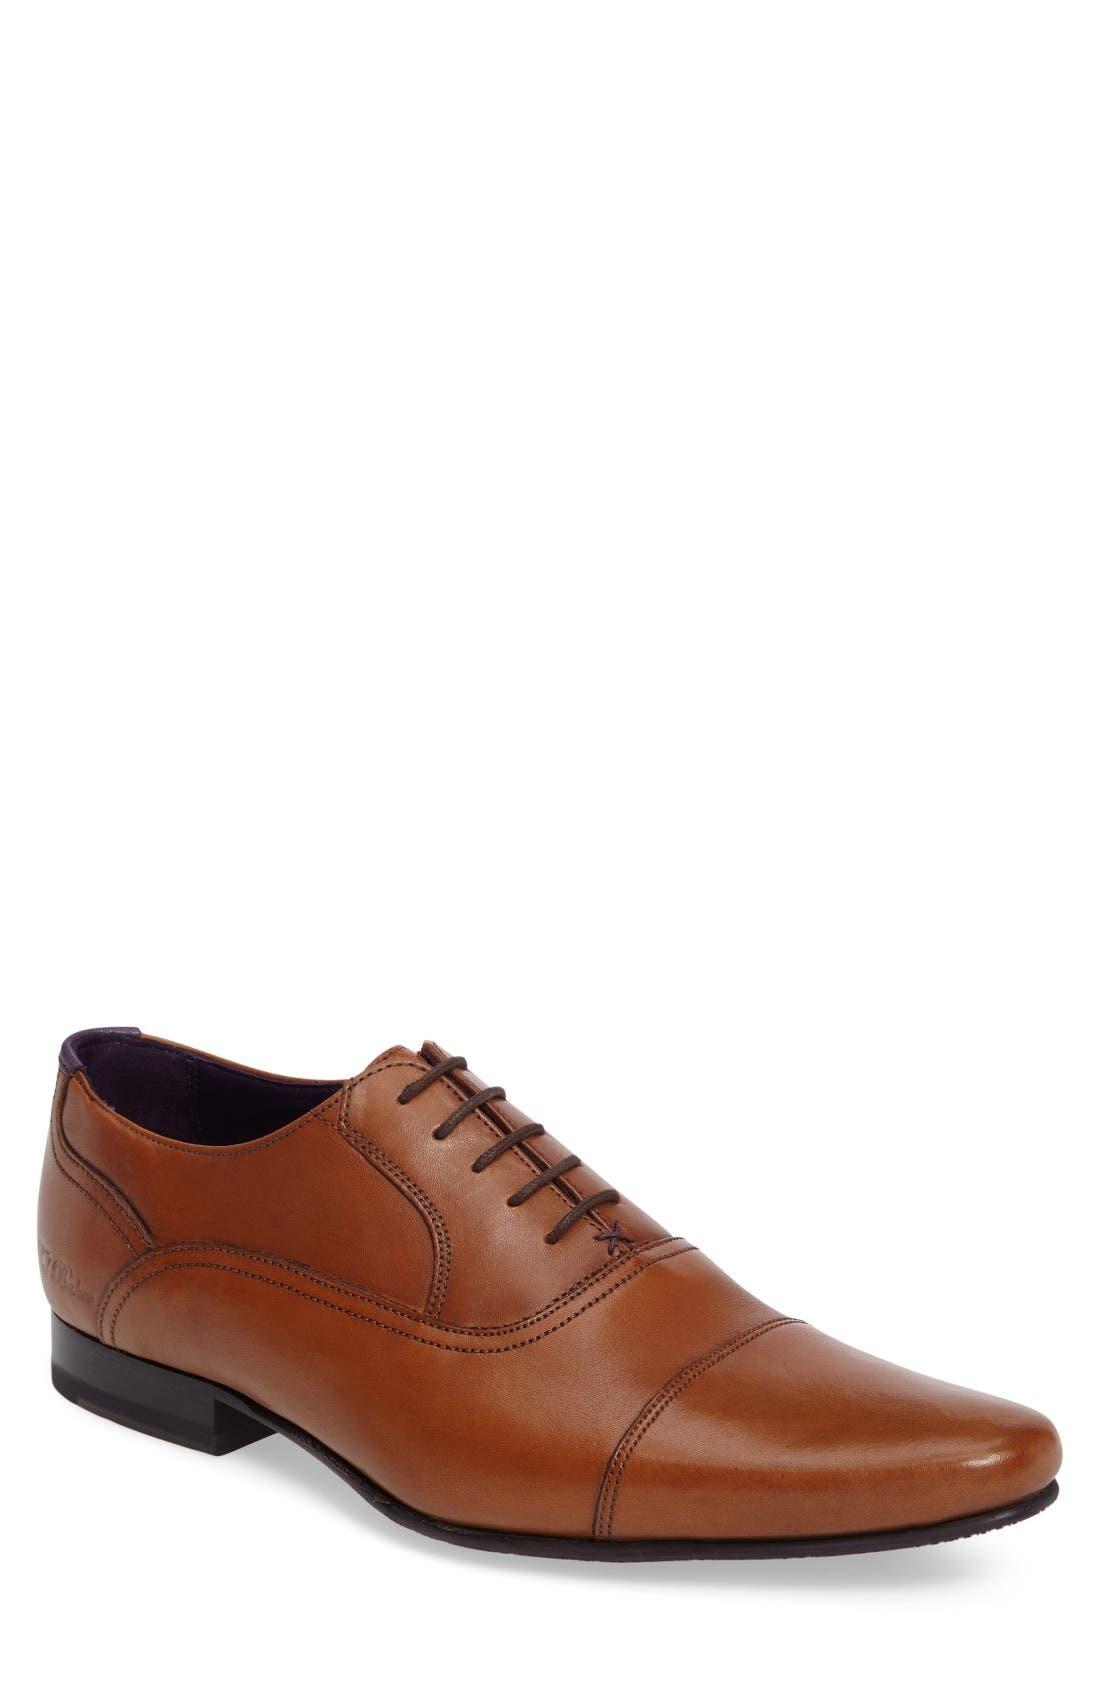 Rogrr 3 Cap Toe Oxford,                             Main thumbnail 1, color,                             Tan Leather